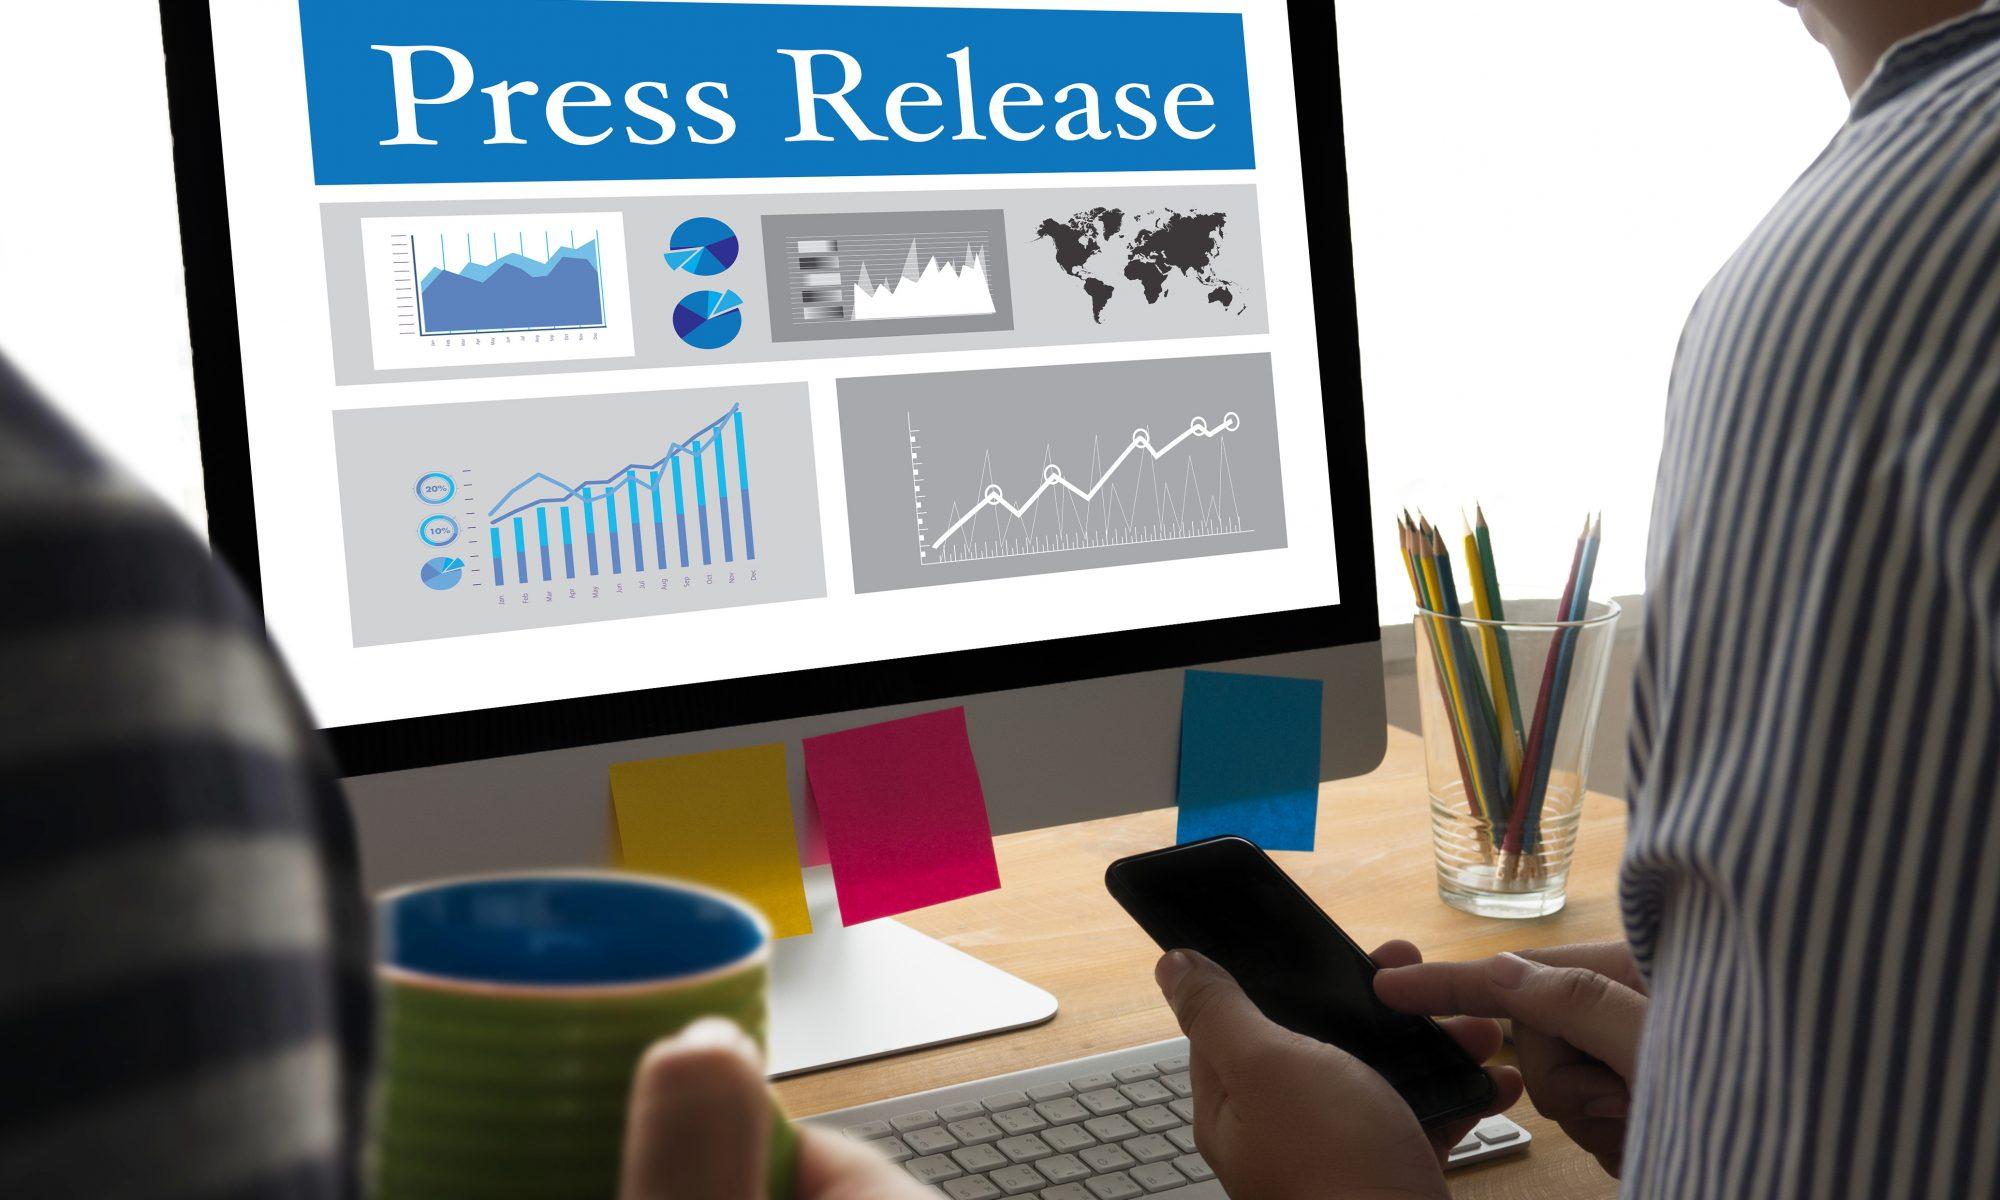 press release distribution, good press release